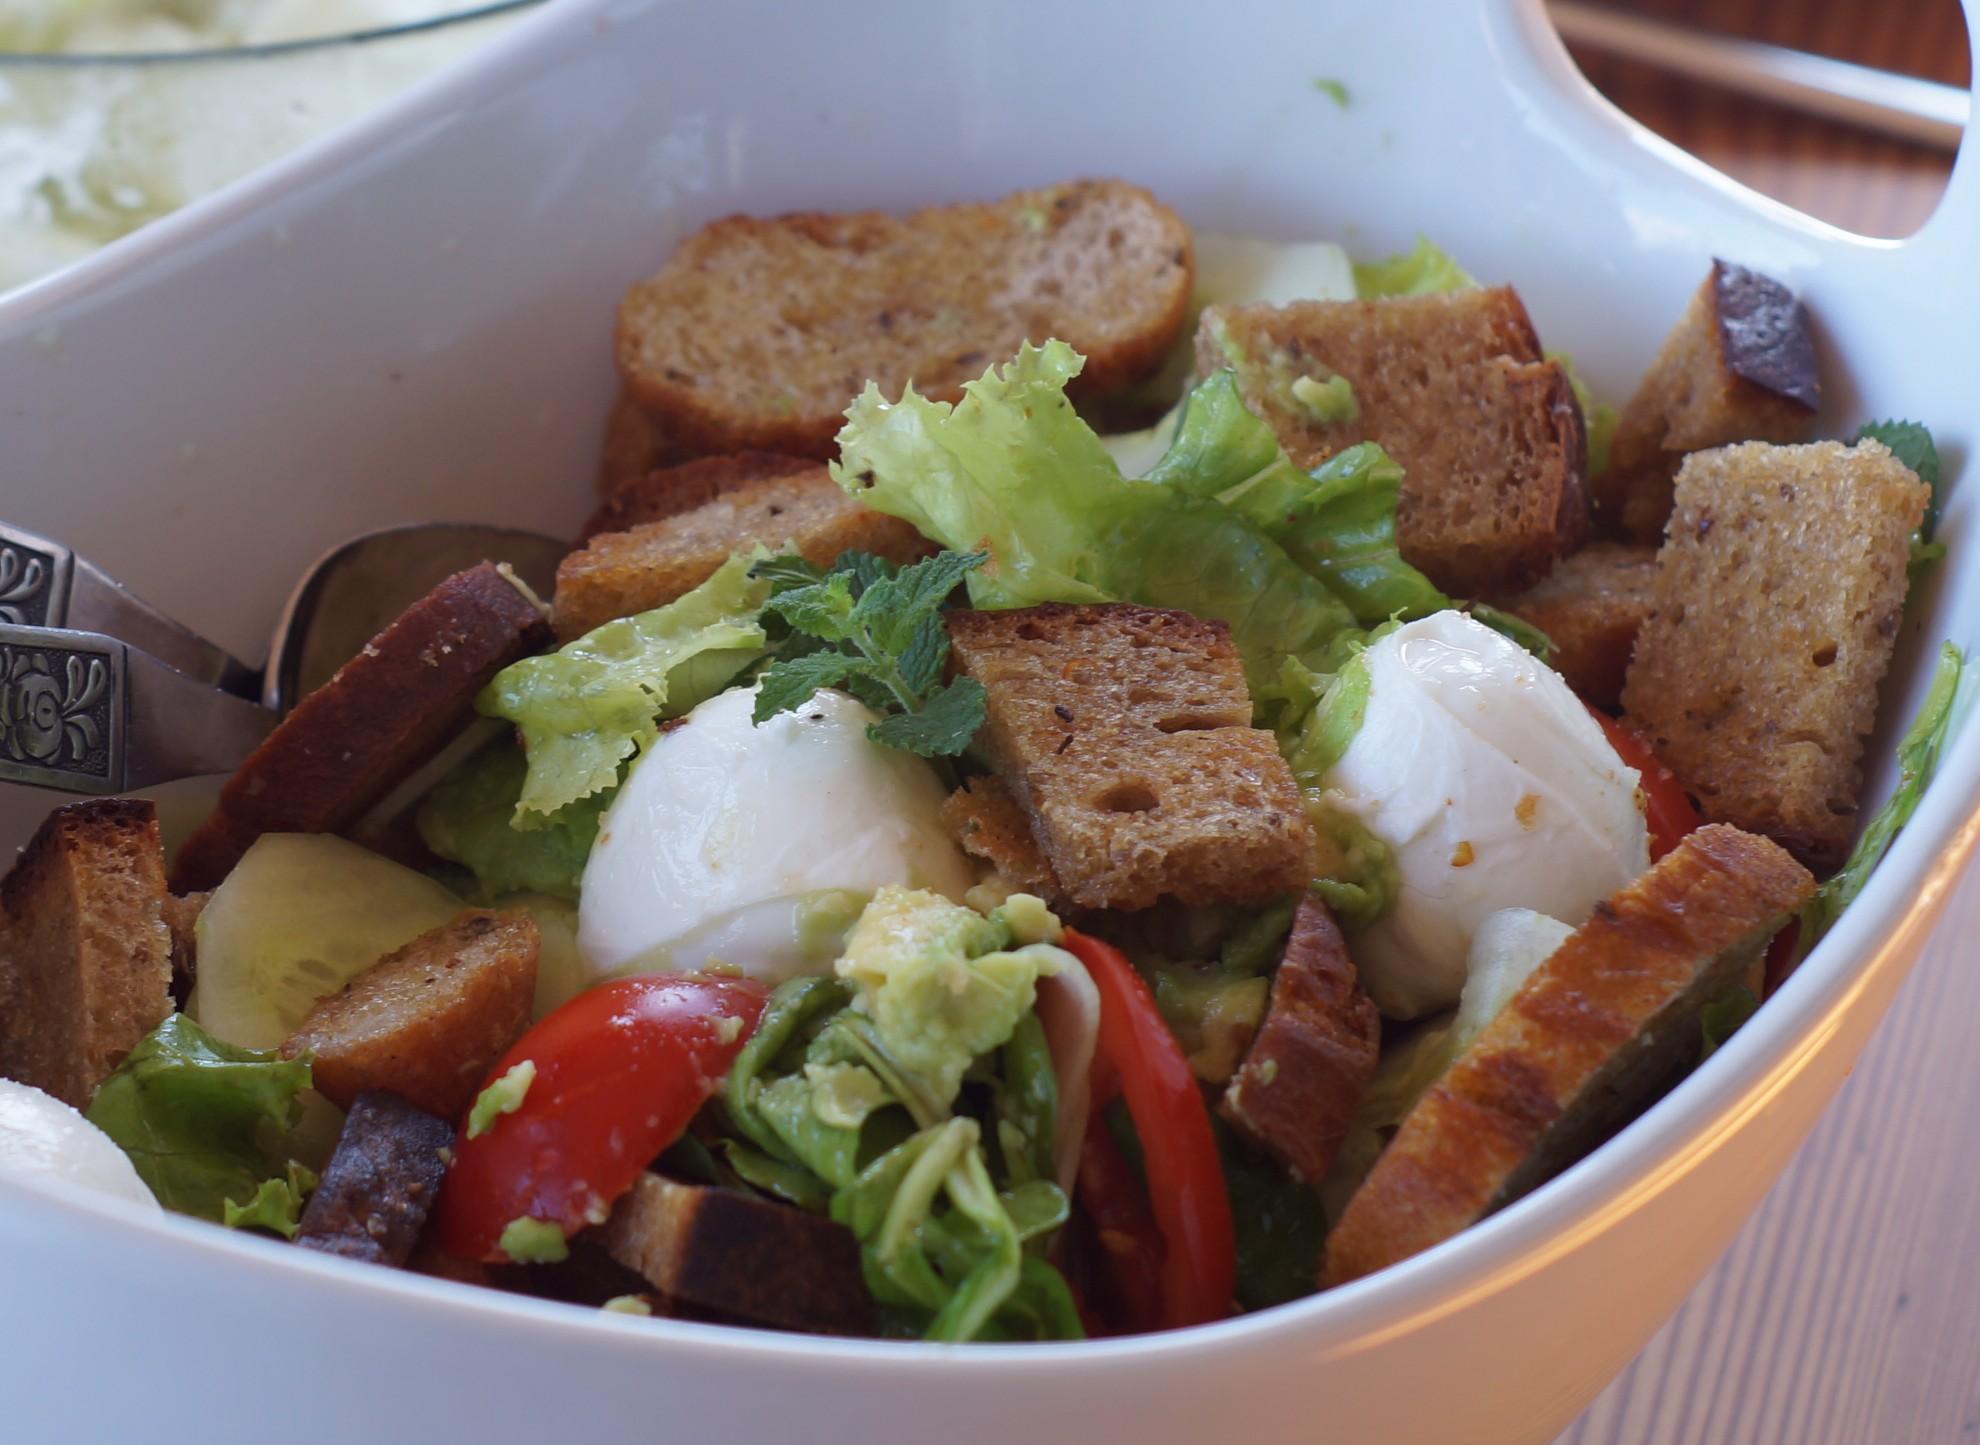 Brotsalat mit Minze und Büffelmozzarella